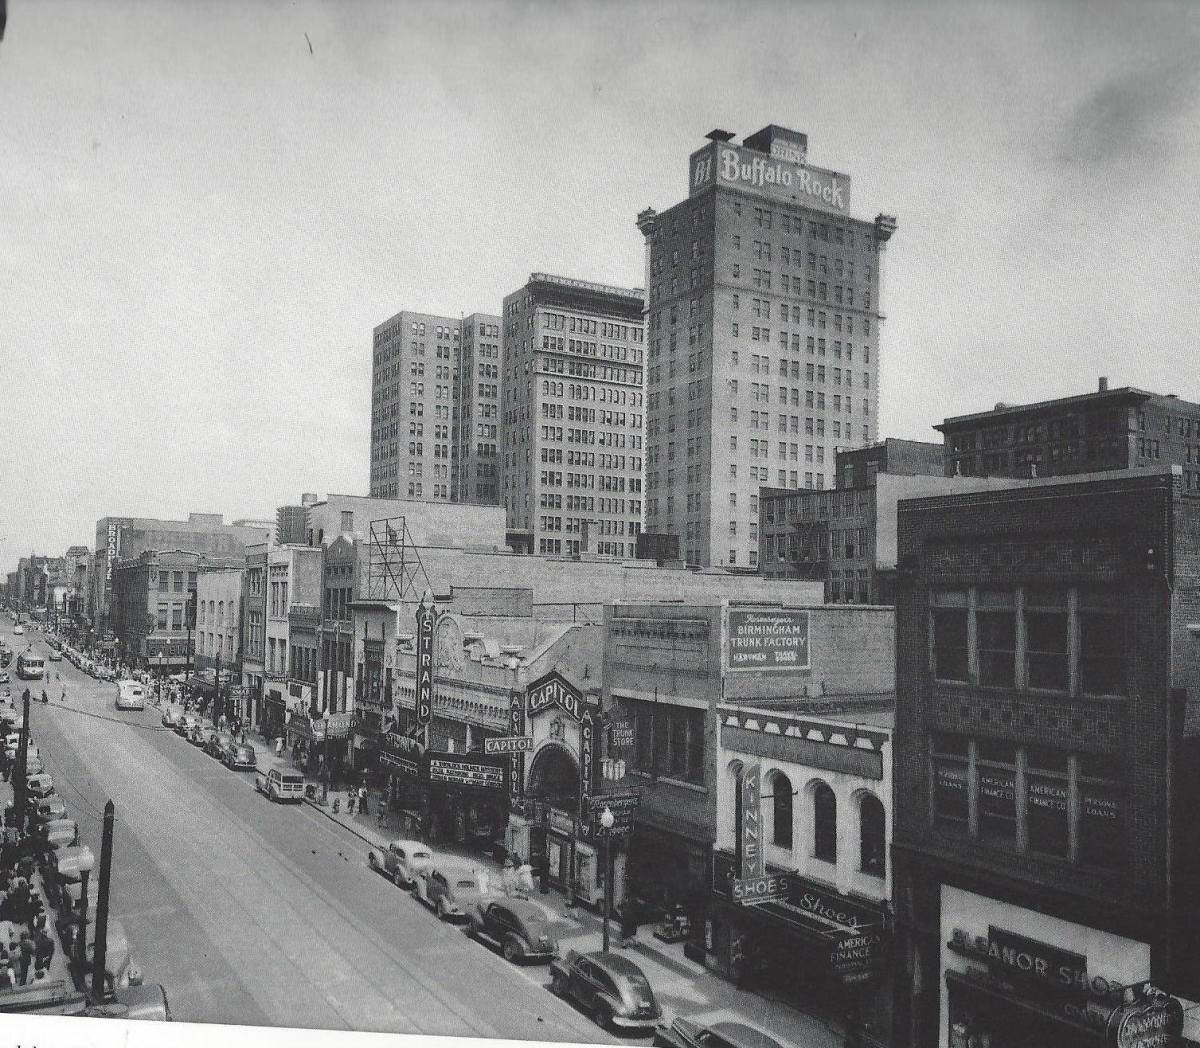 A virtual tour through 5 of Birmingham's Historic Districts